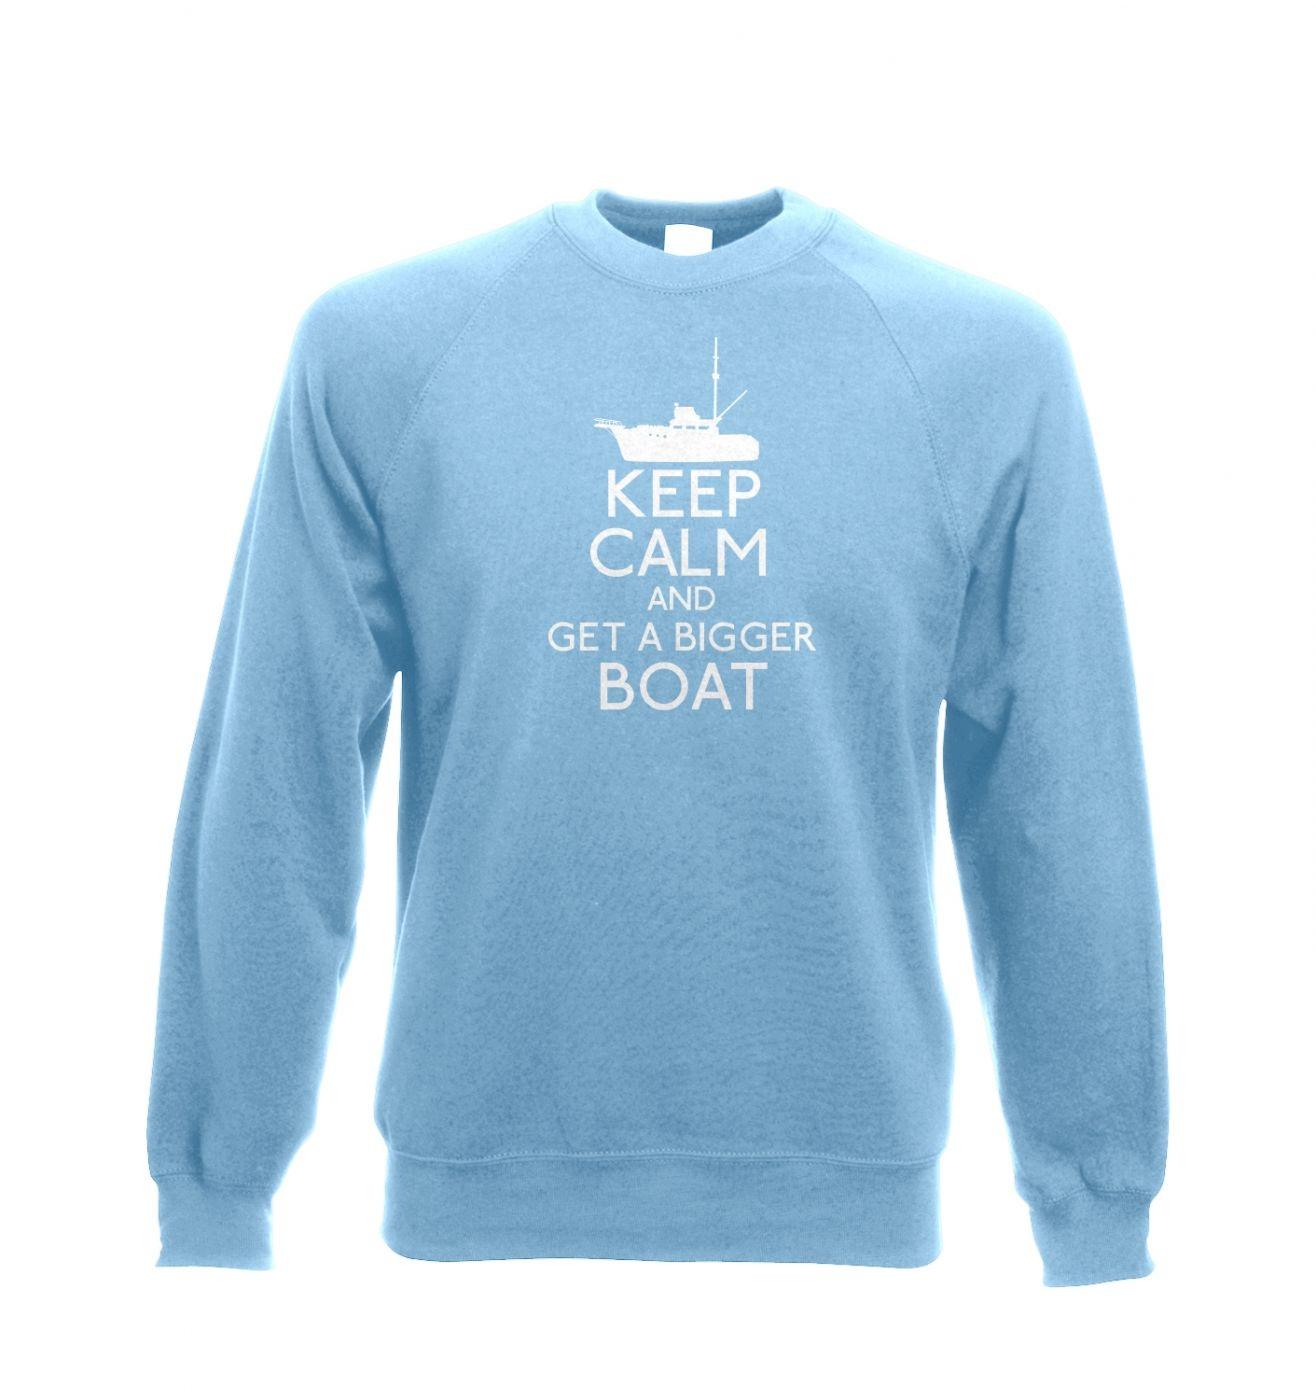 Keep Calm and Get a Bigger Boat Adult Crewneck Sweatshirt